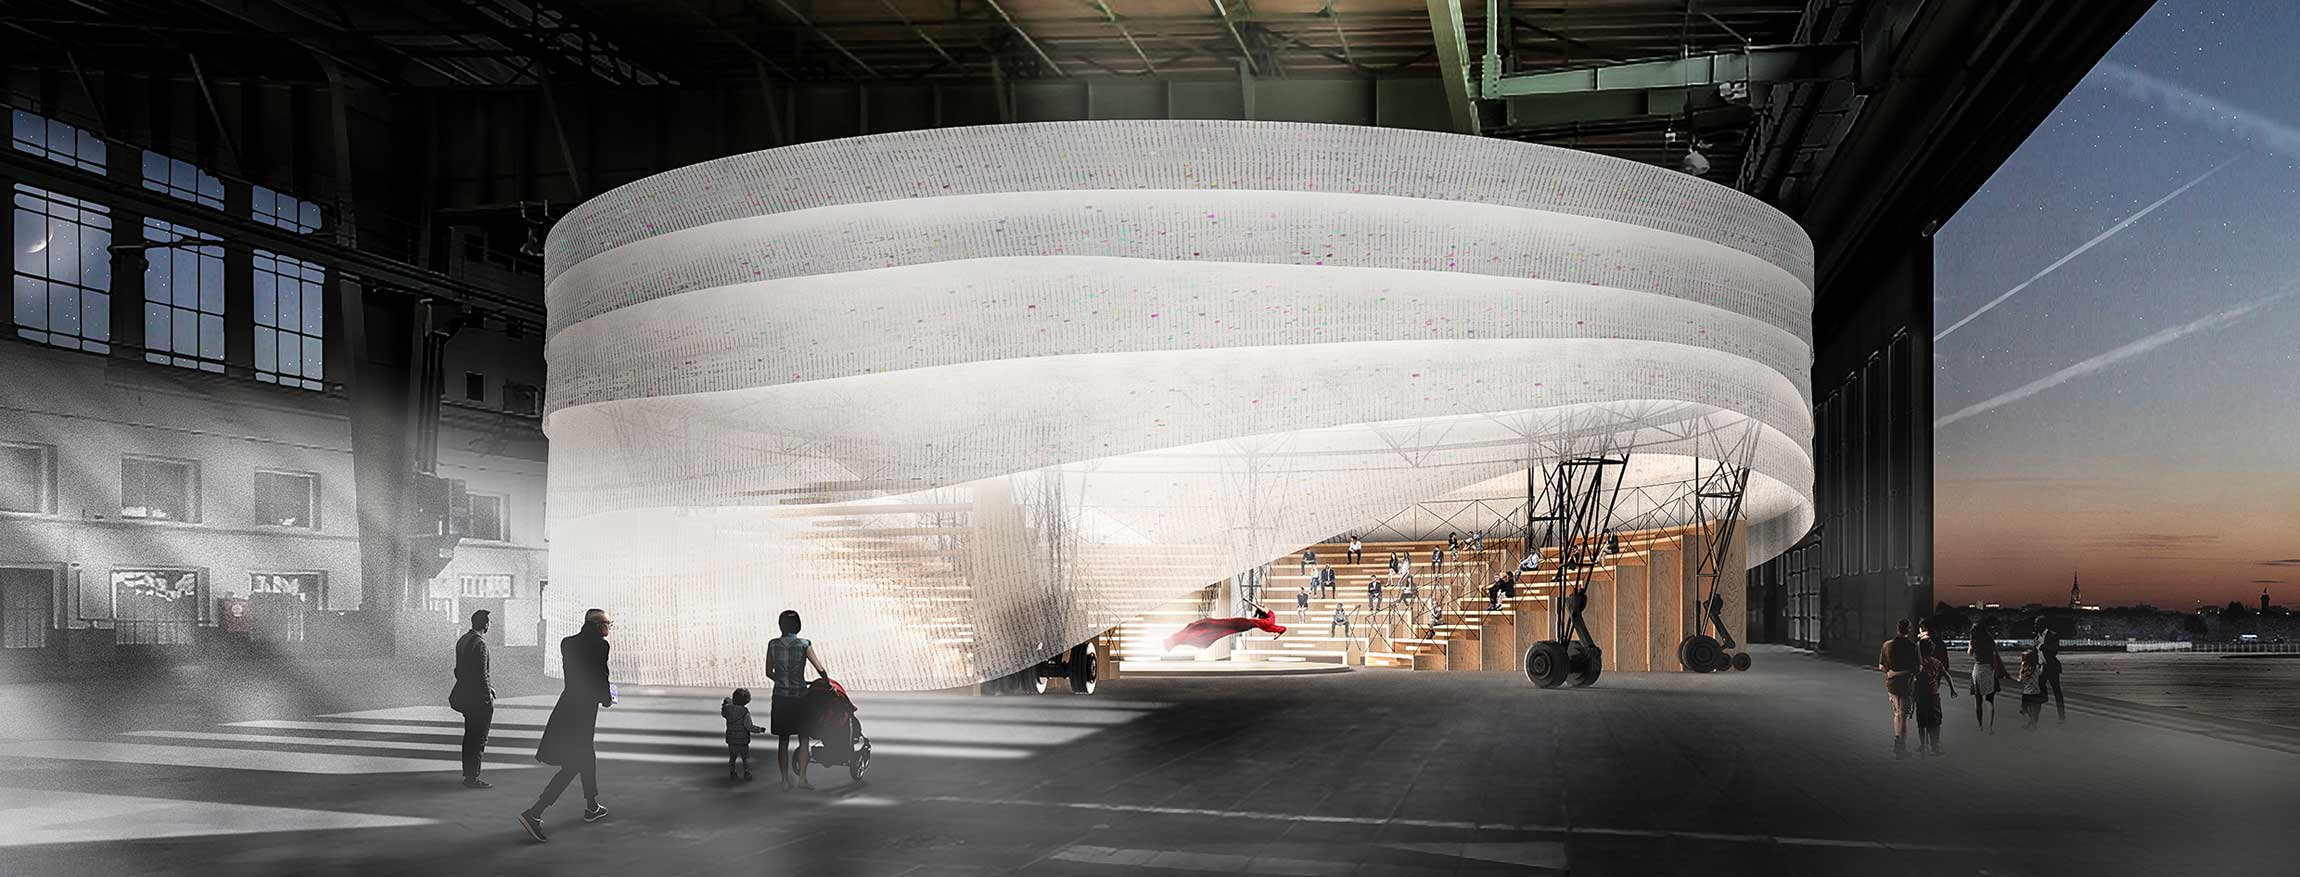 Tempelhof_Interior_A3-150dpiKere-Architecture.jpg